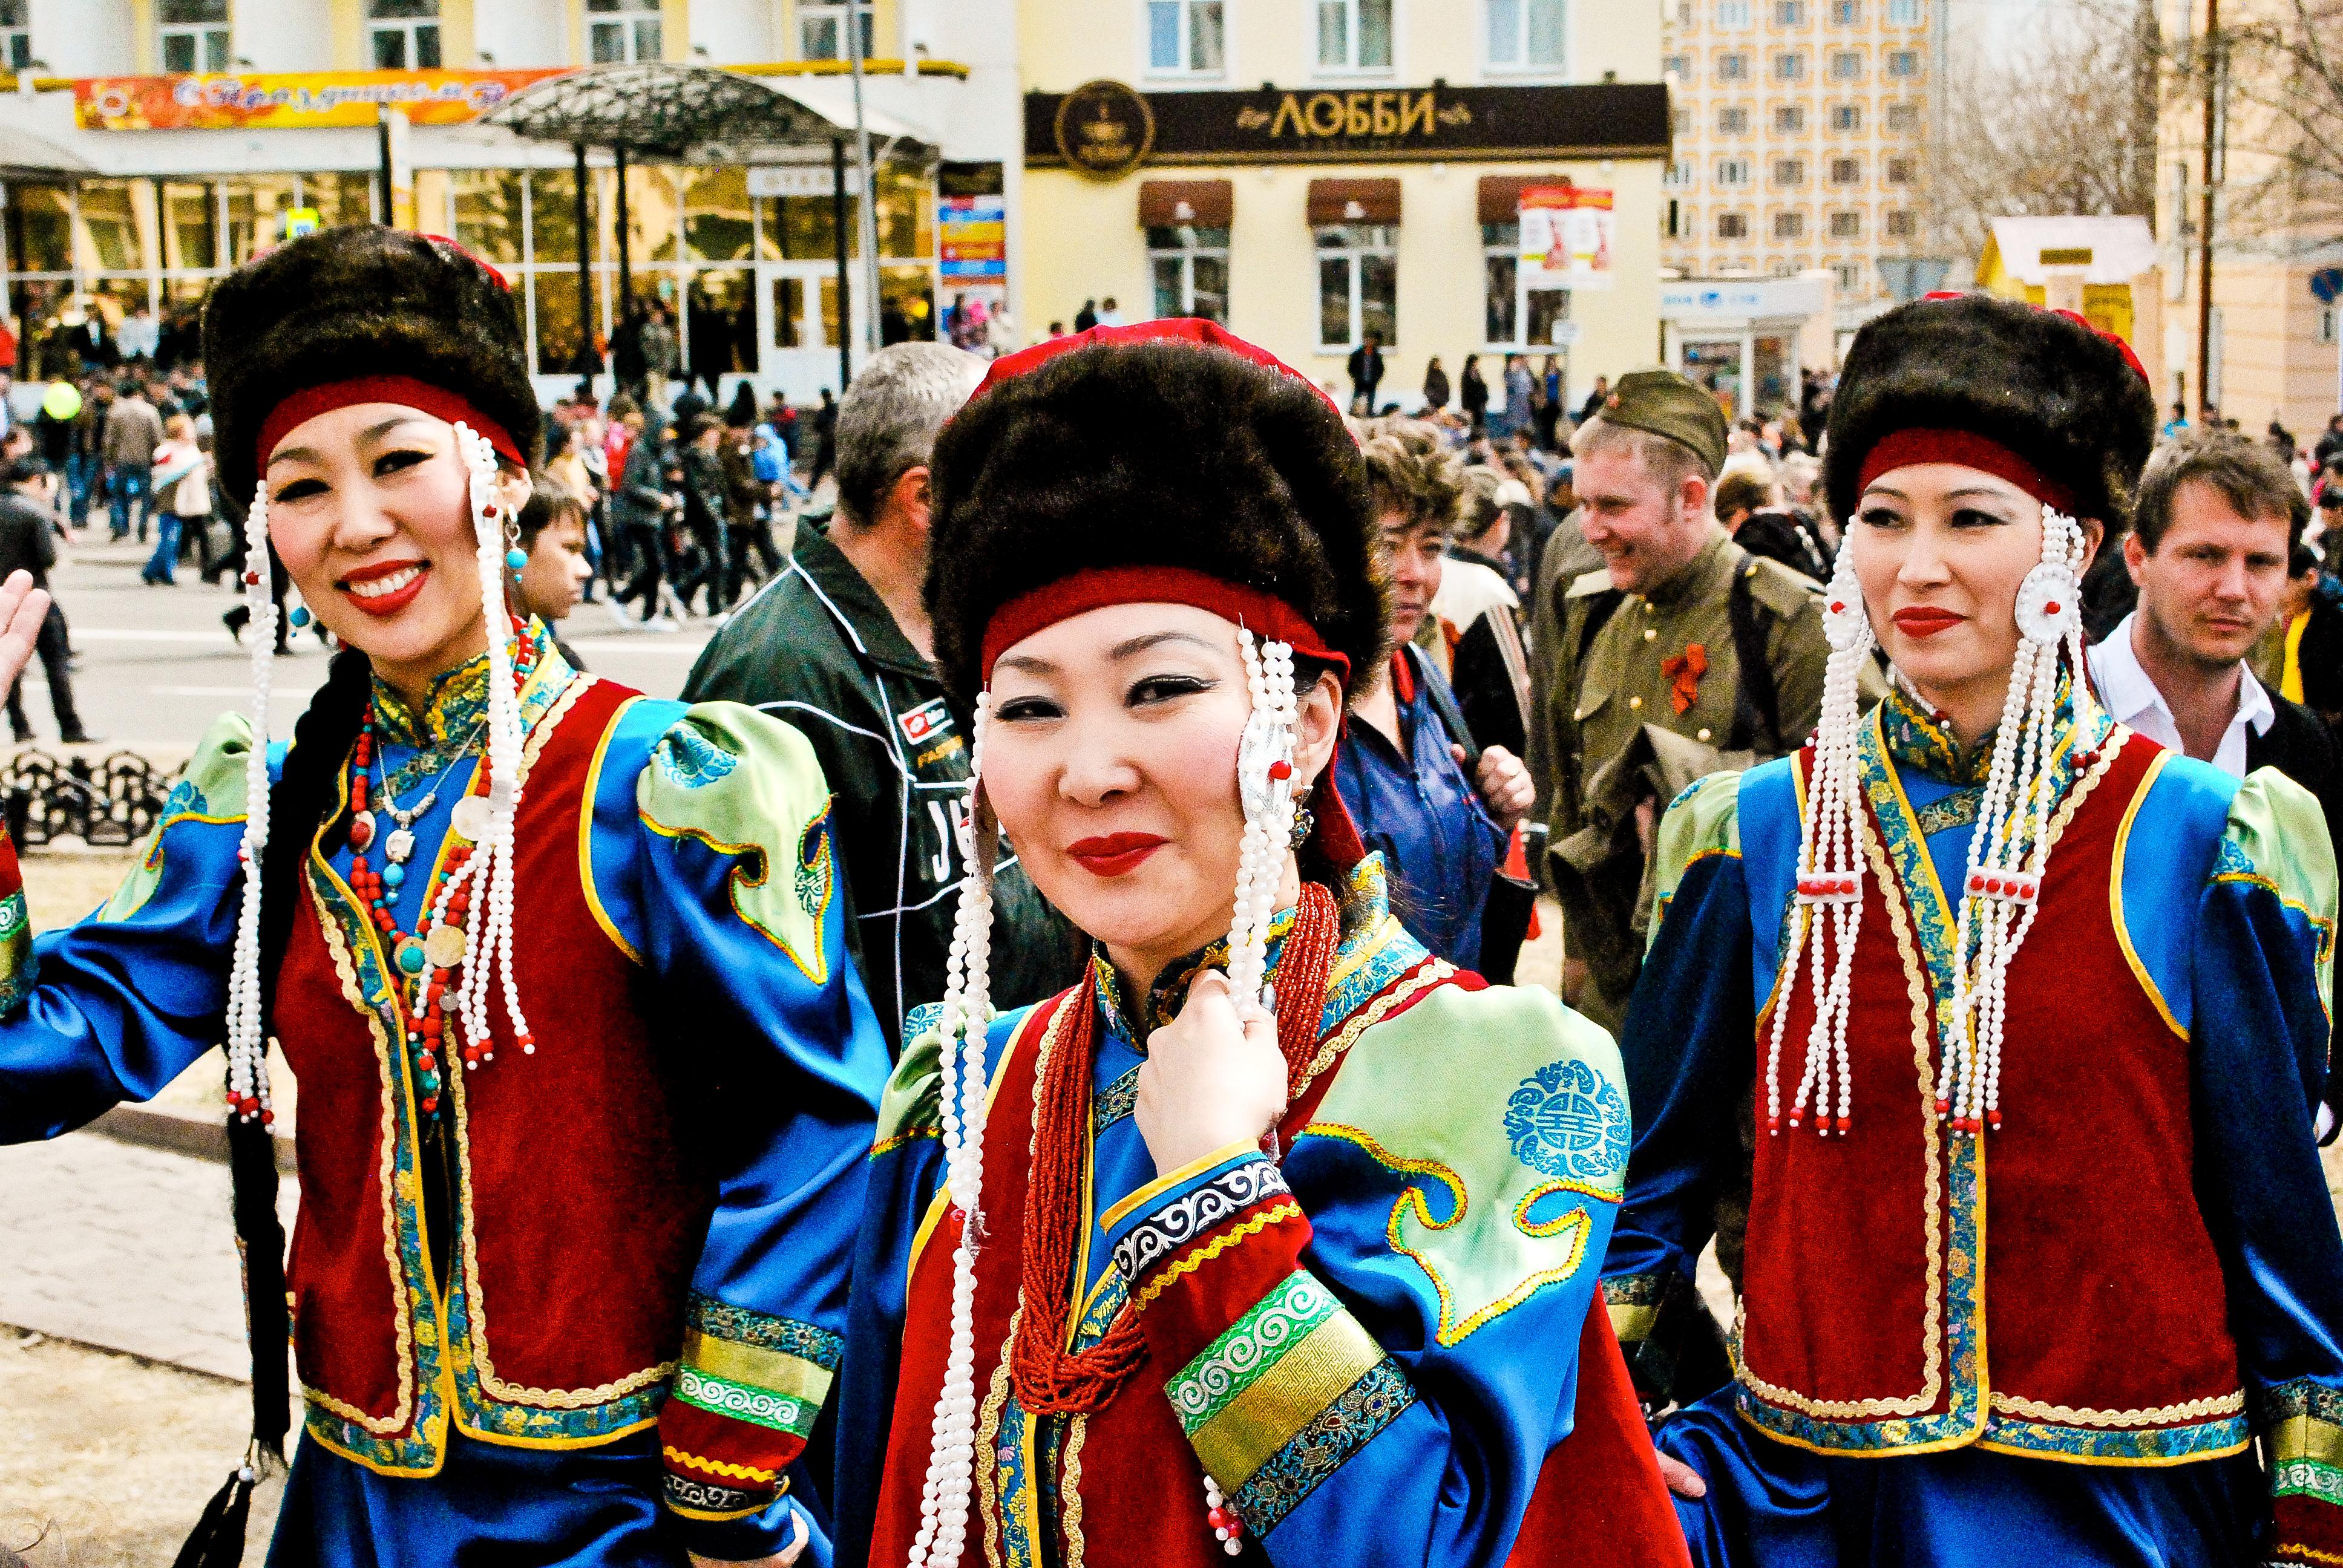 Siberian Shamanism: The Shanar Ritual of the Buryats